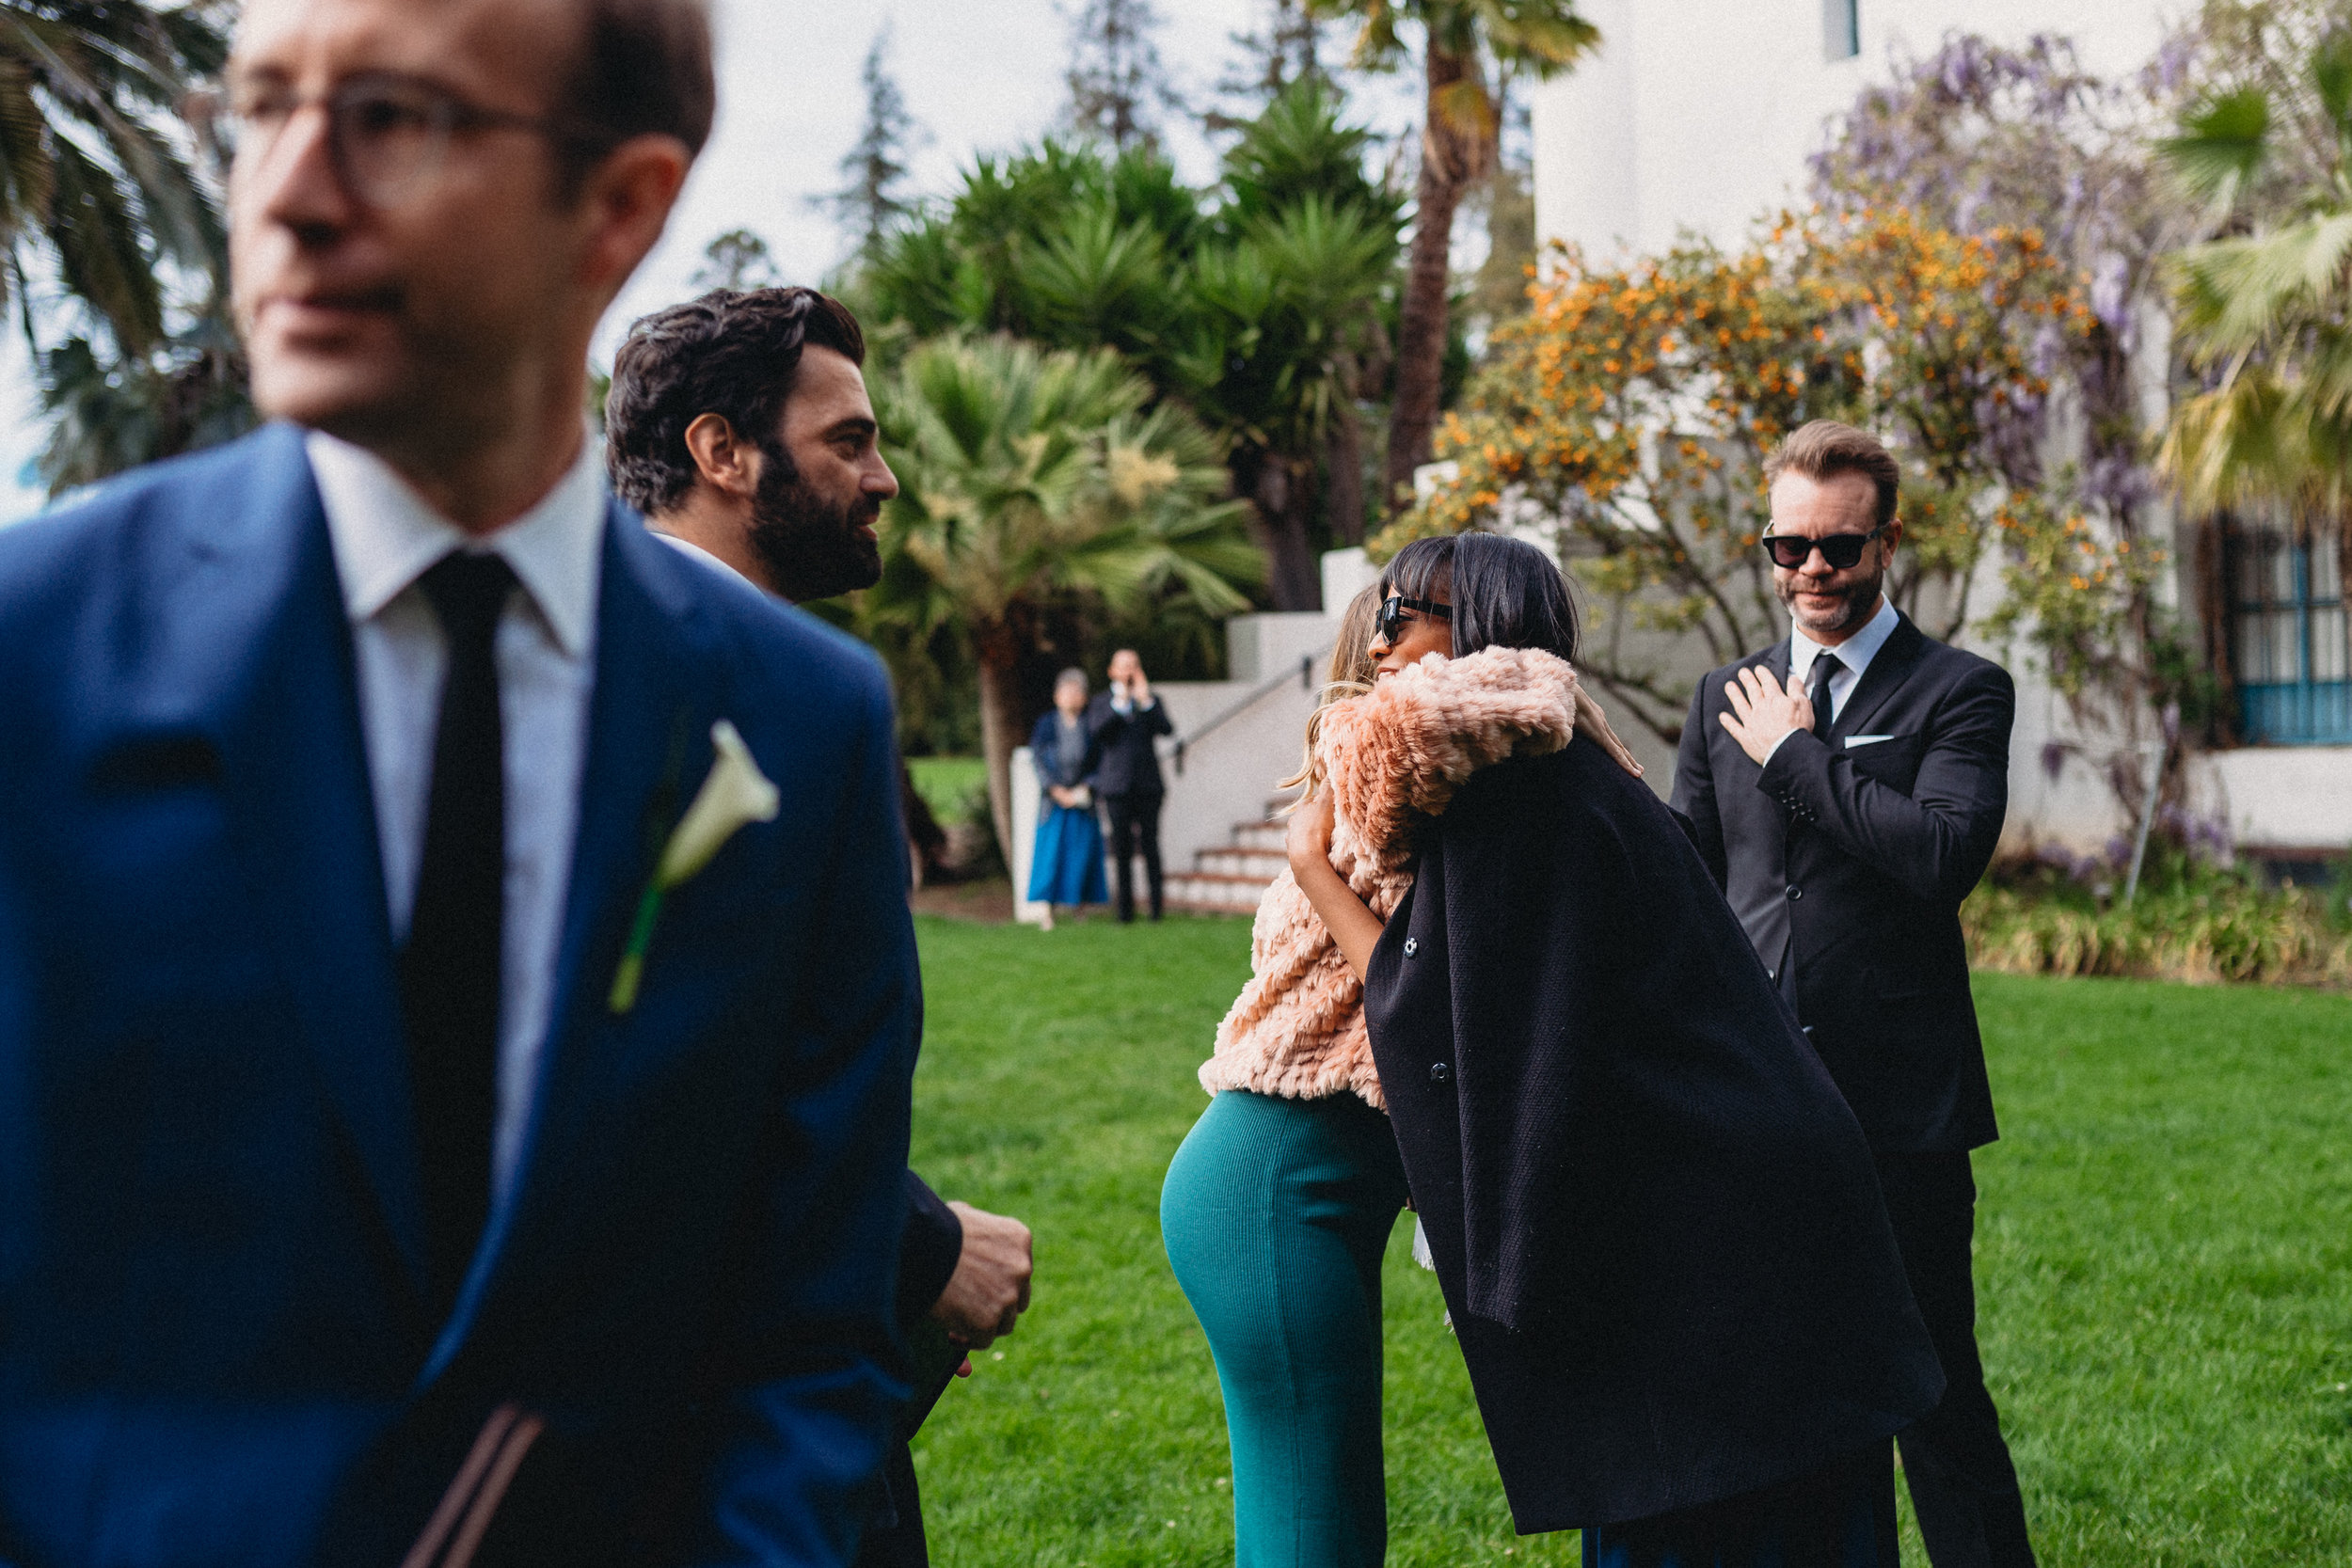 wedding-photography-santa-barbara-courthouse-rebeccaylasotras-22.jpg